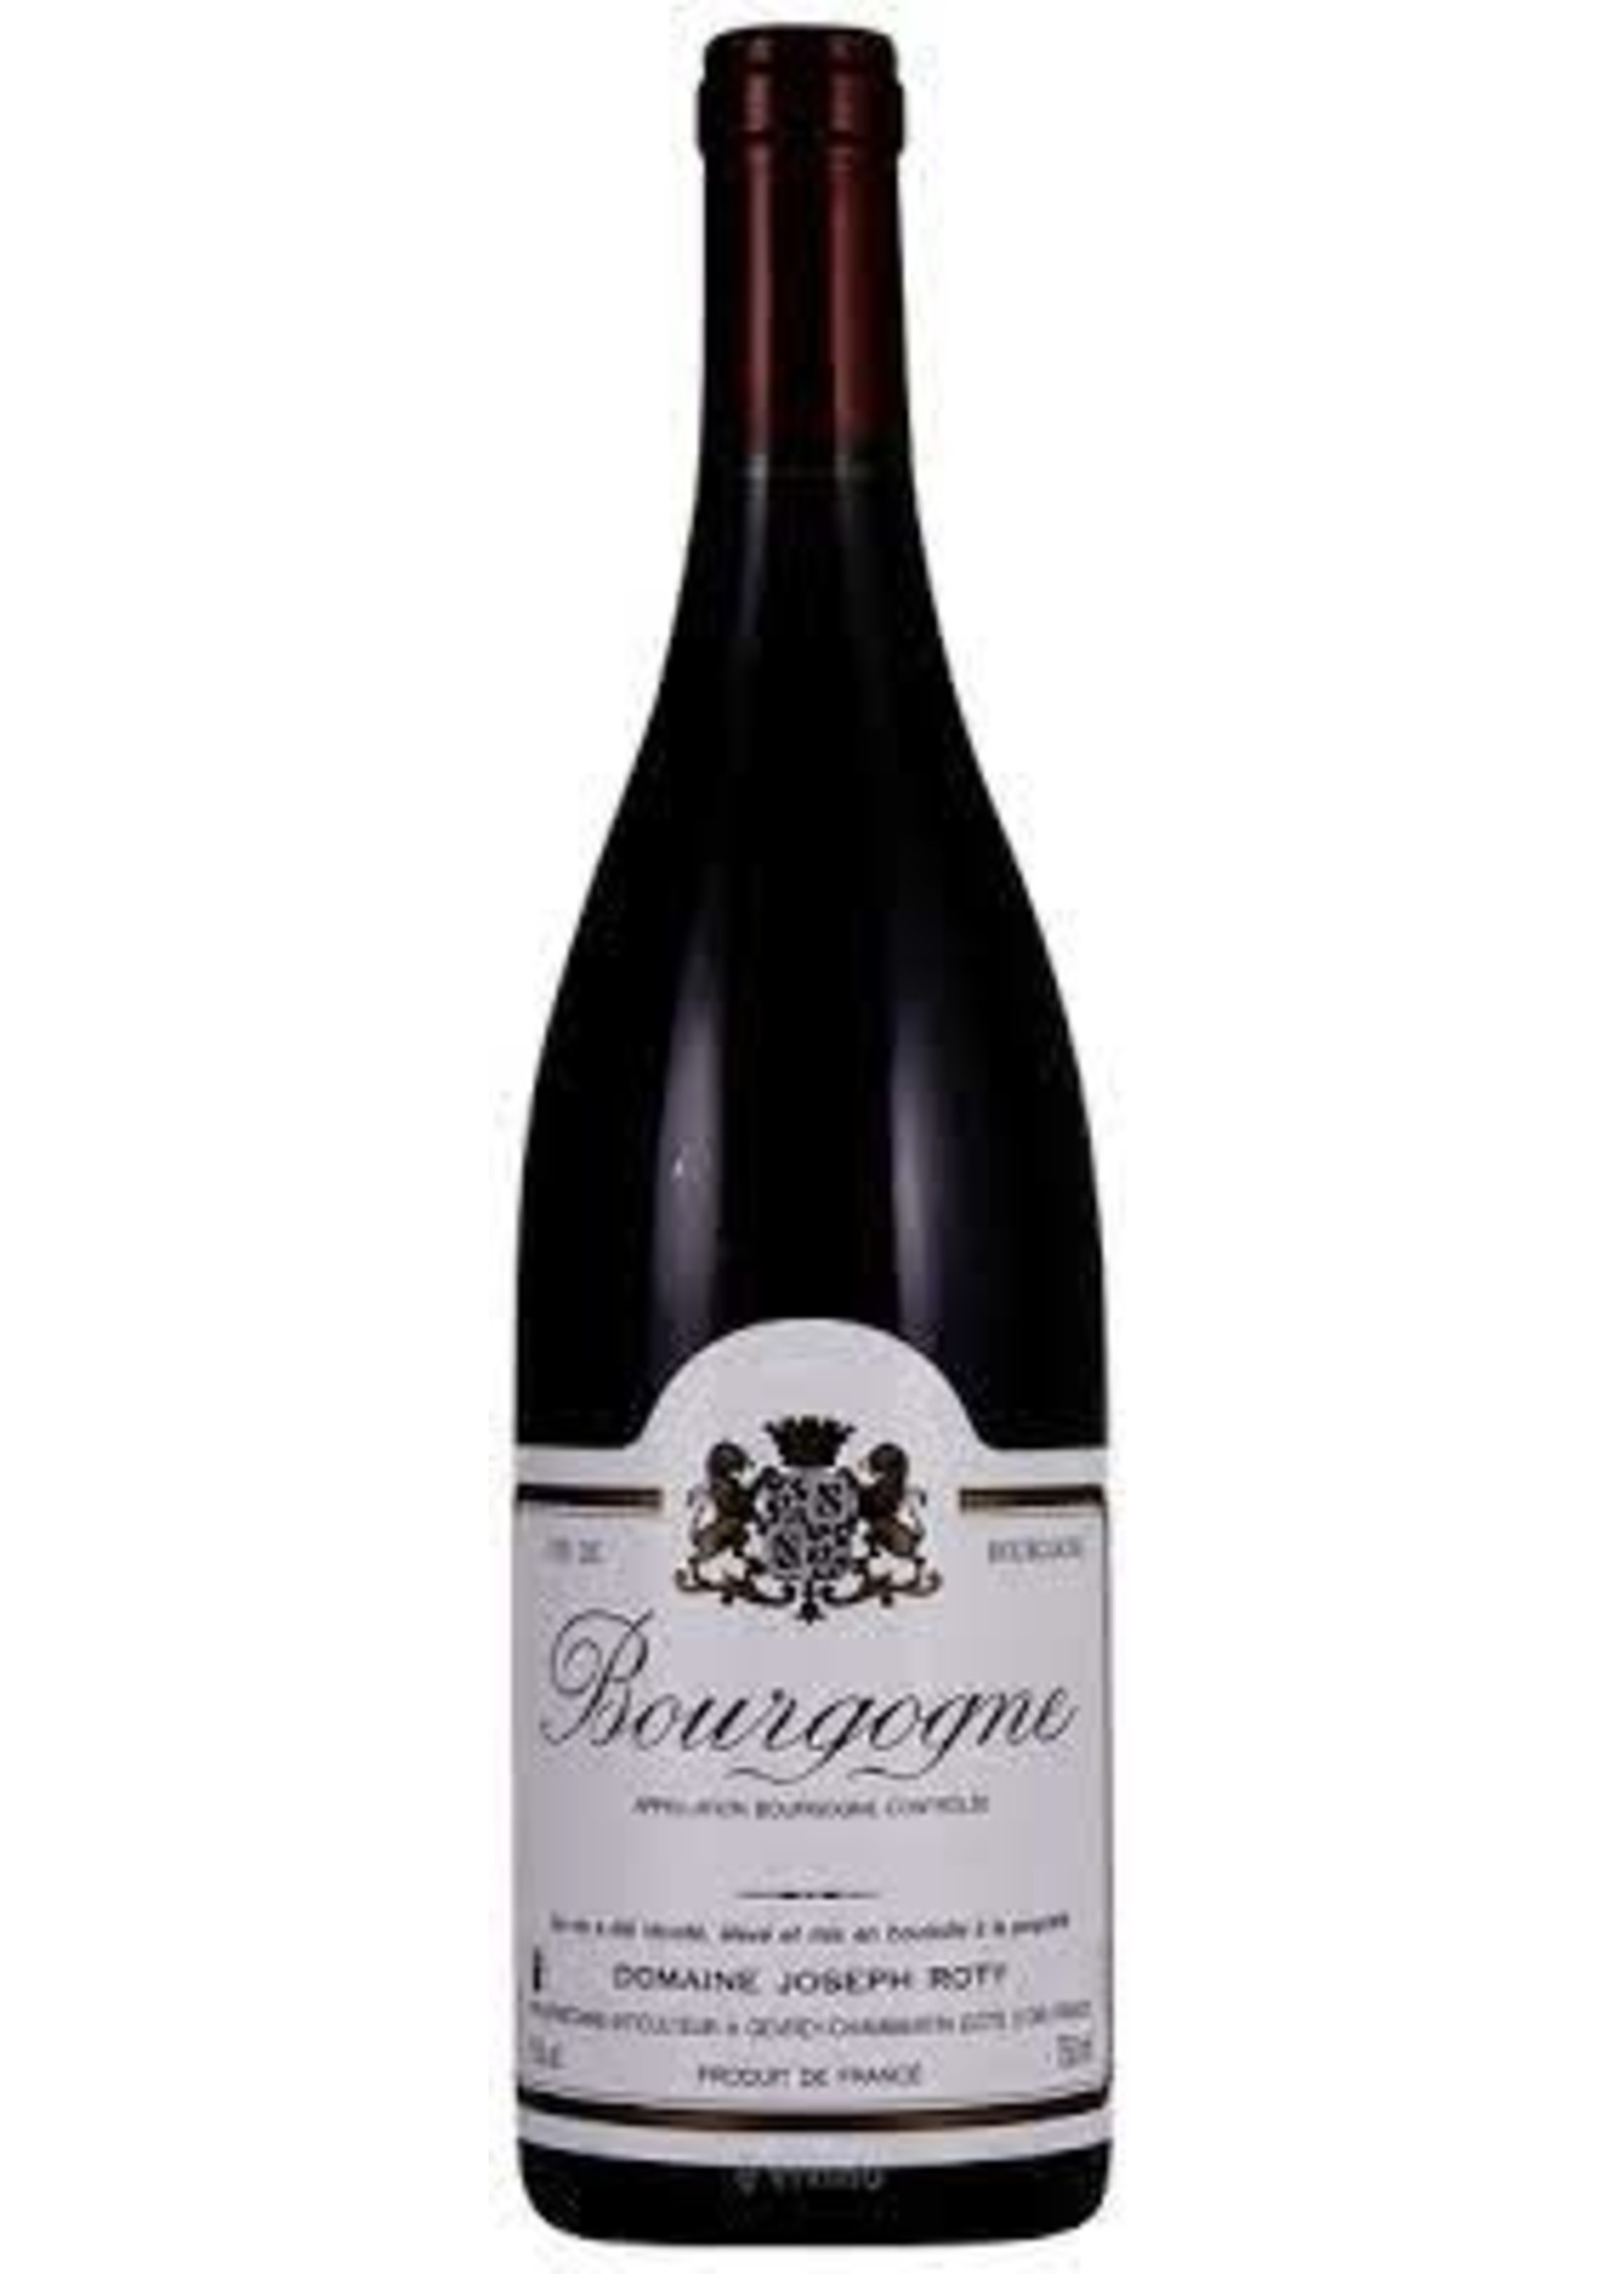 Joseph Roty 2017 Bourgogne Rouge 750ml